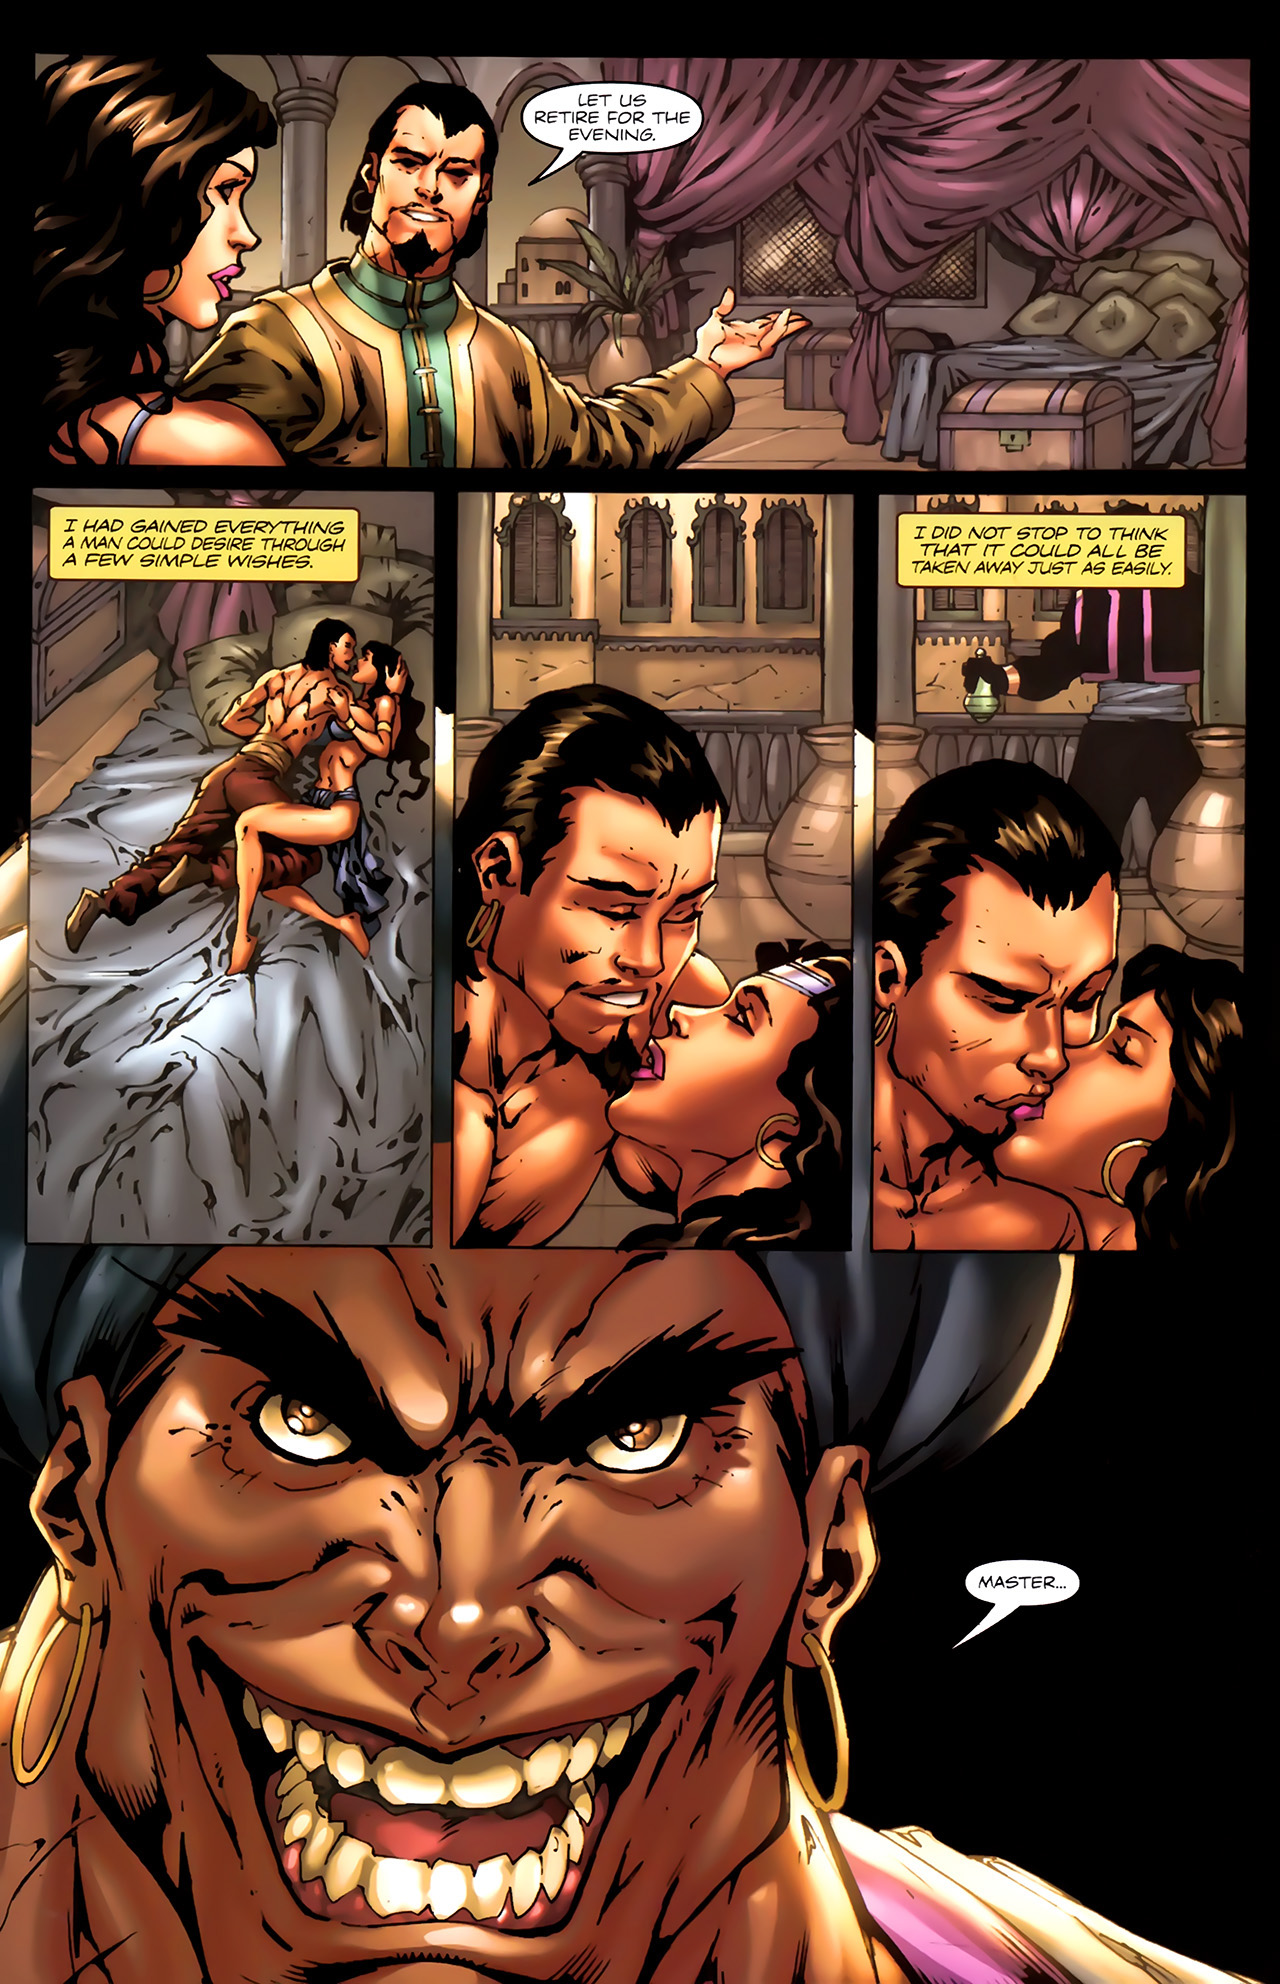 Read online 1001 Arabian Nights: The Adventures of Sinbad comic -  Issue #7 - 20